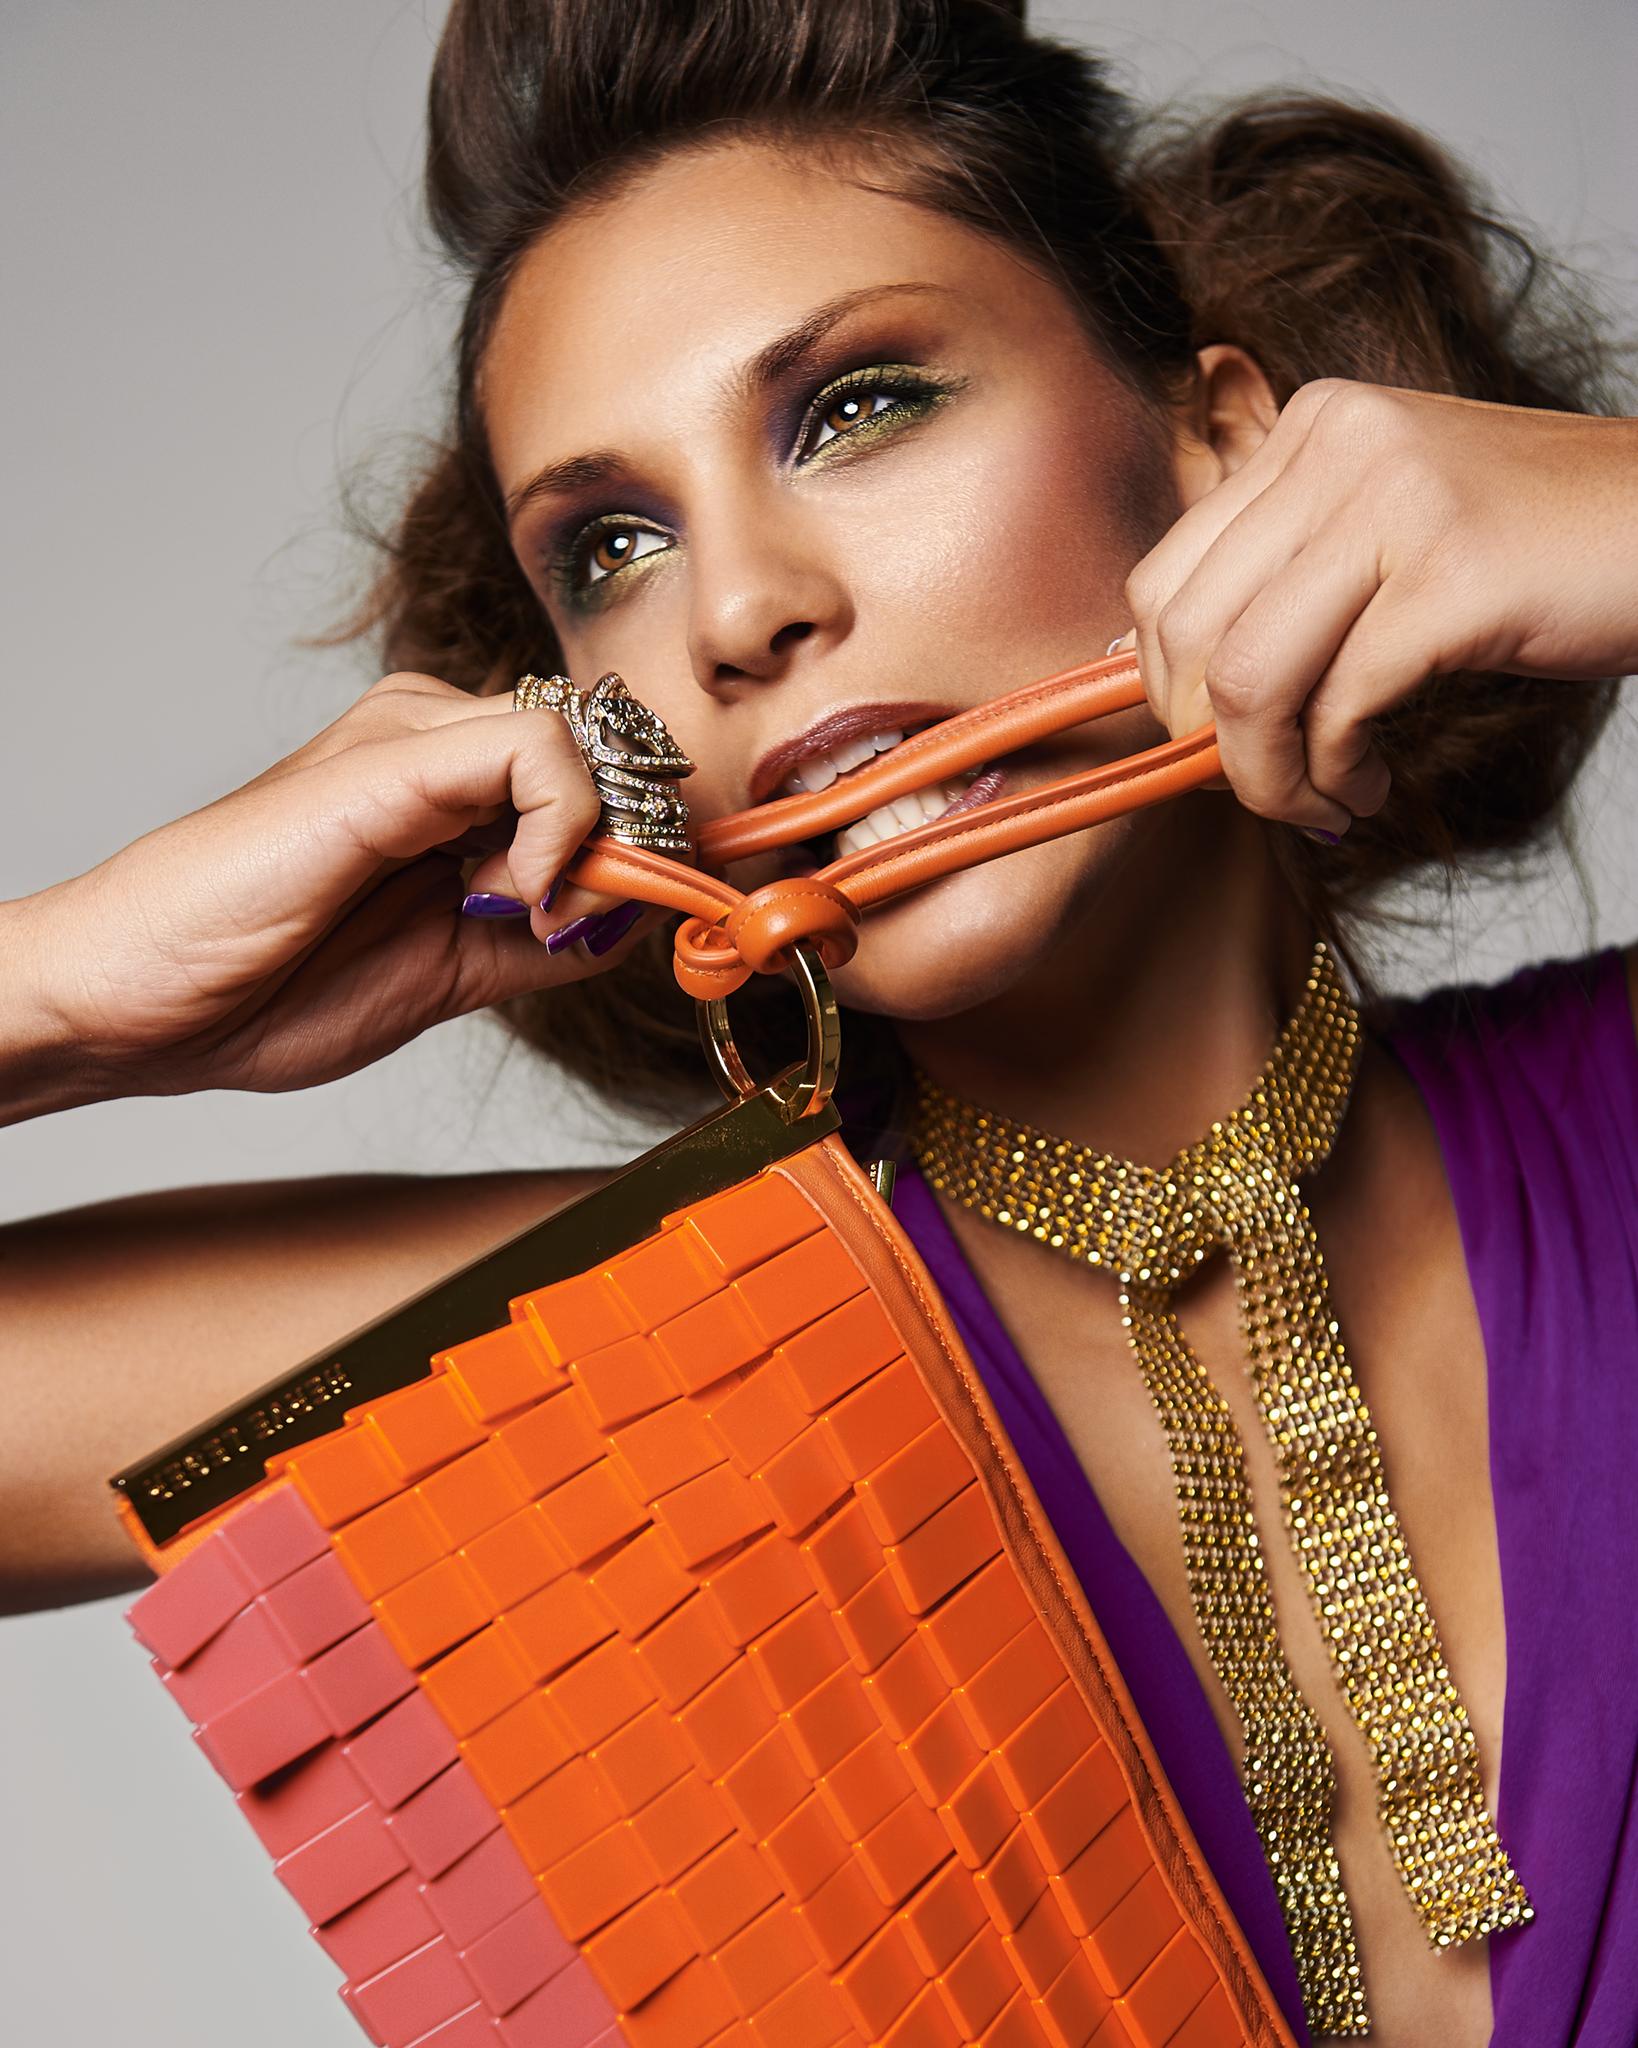 BRAZILIAN RETRO by Antonio Martez | Fashion & Beauty Photographer | New York